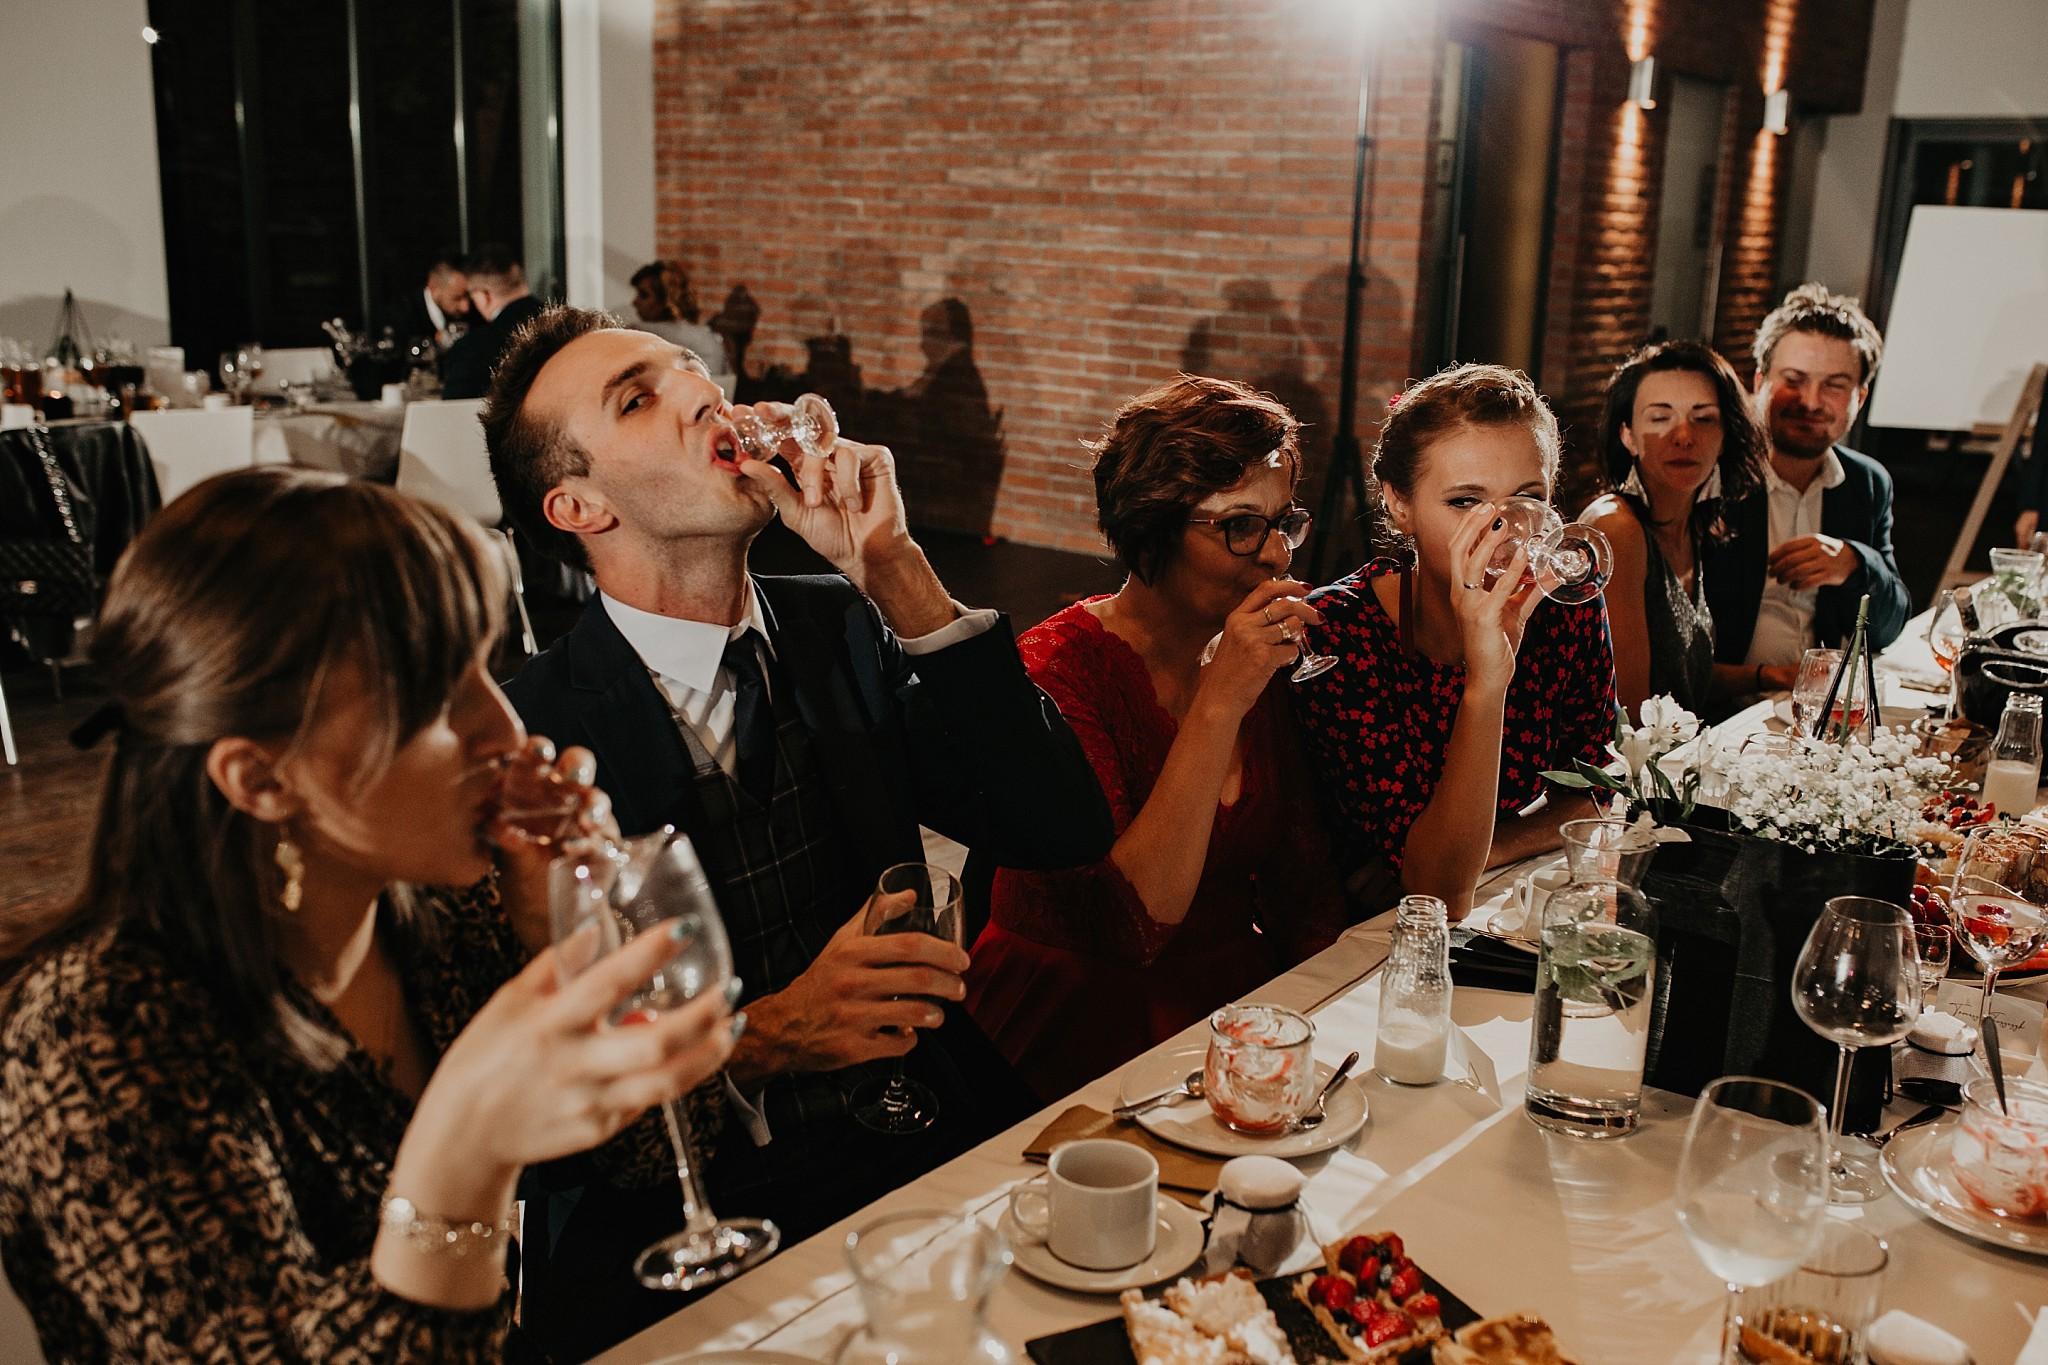 fotograf poznan wesele dobra truskawka piekne wesele pod poznaniem wesele w dobrej truskawce piekna para mloda slub marzen slub koronawirus slub listopad wesele koronawirus 380